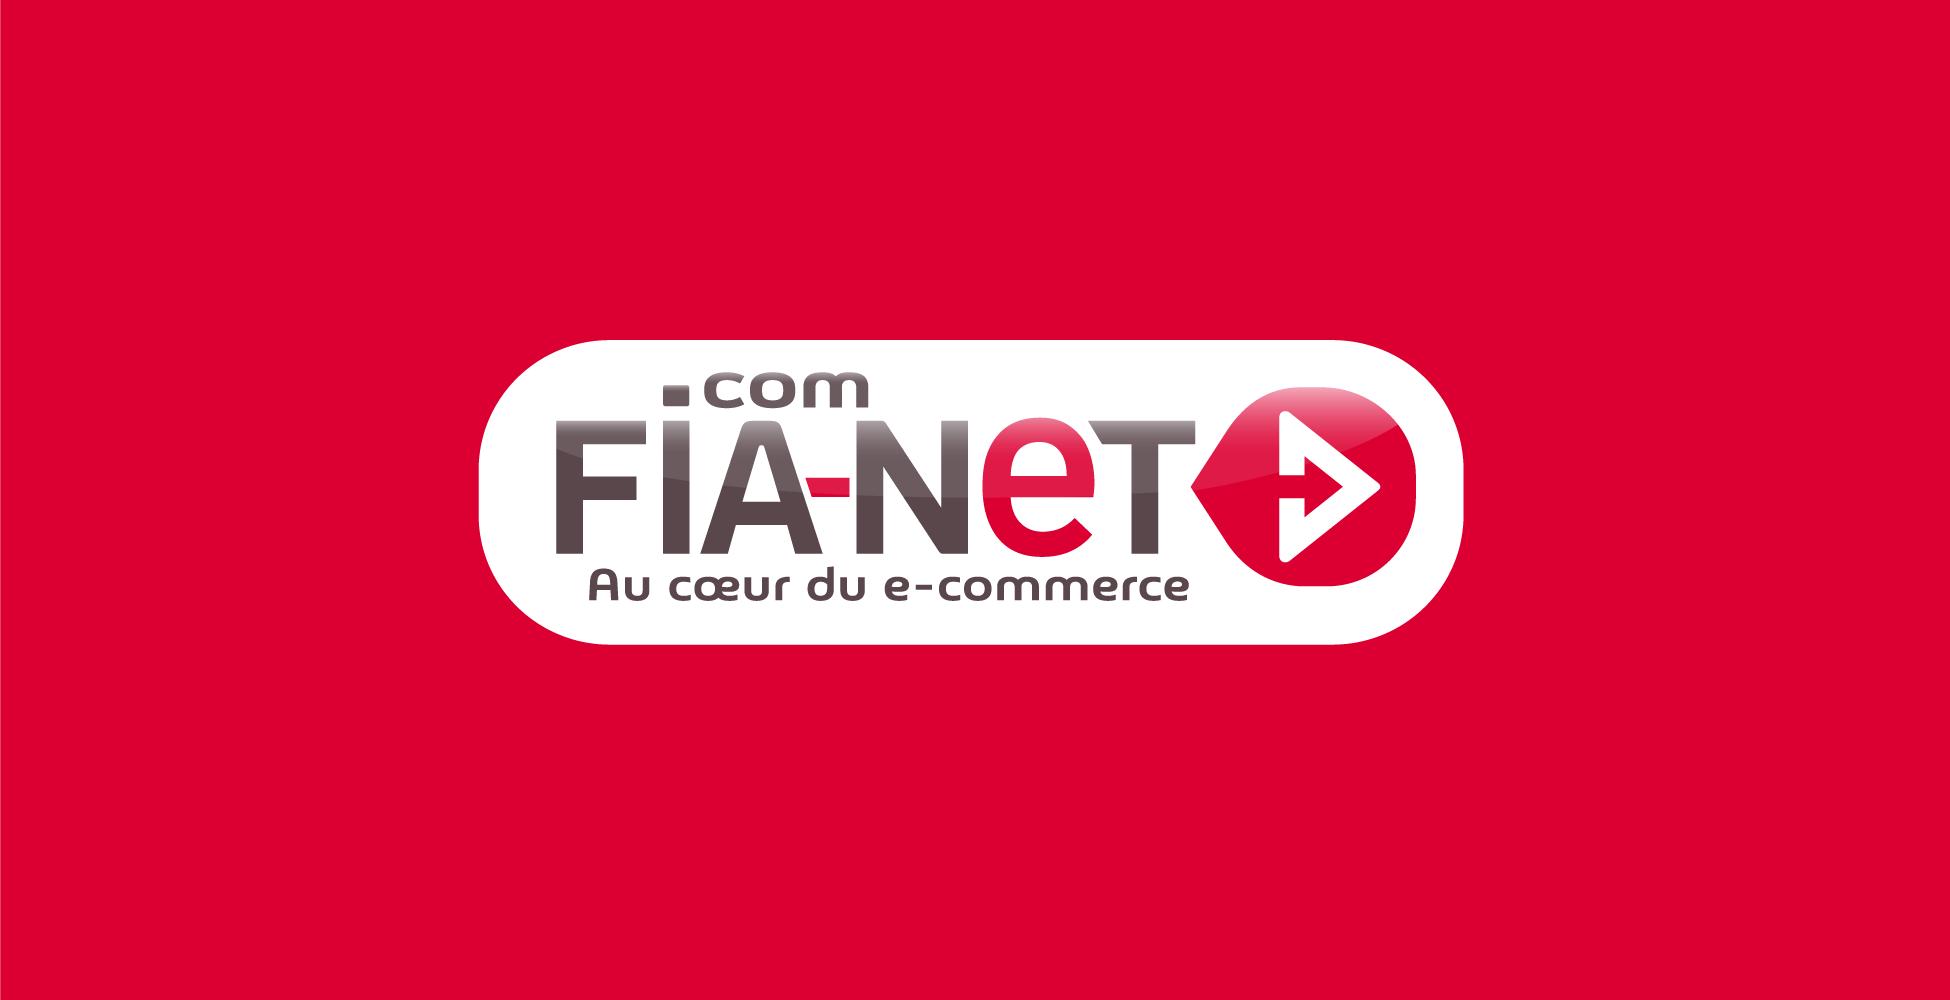 Fianet-logo